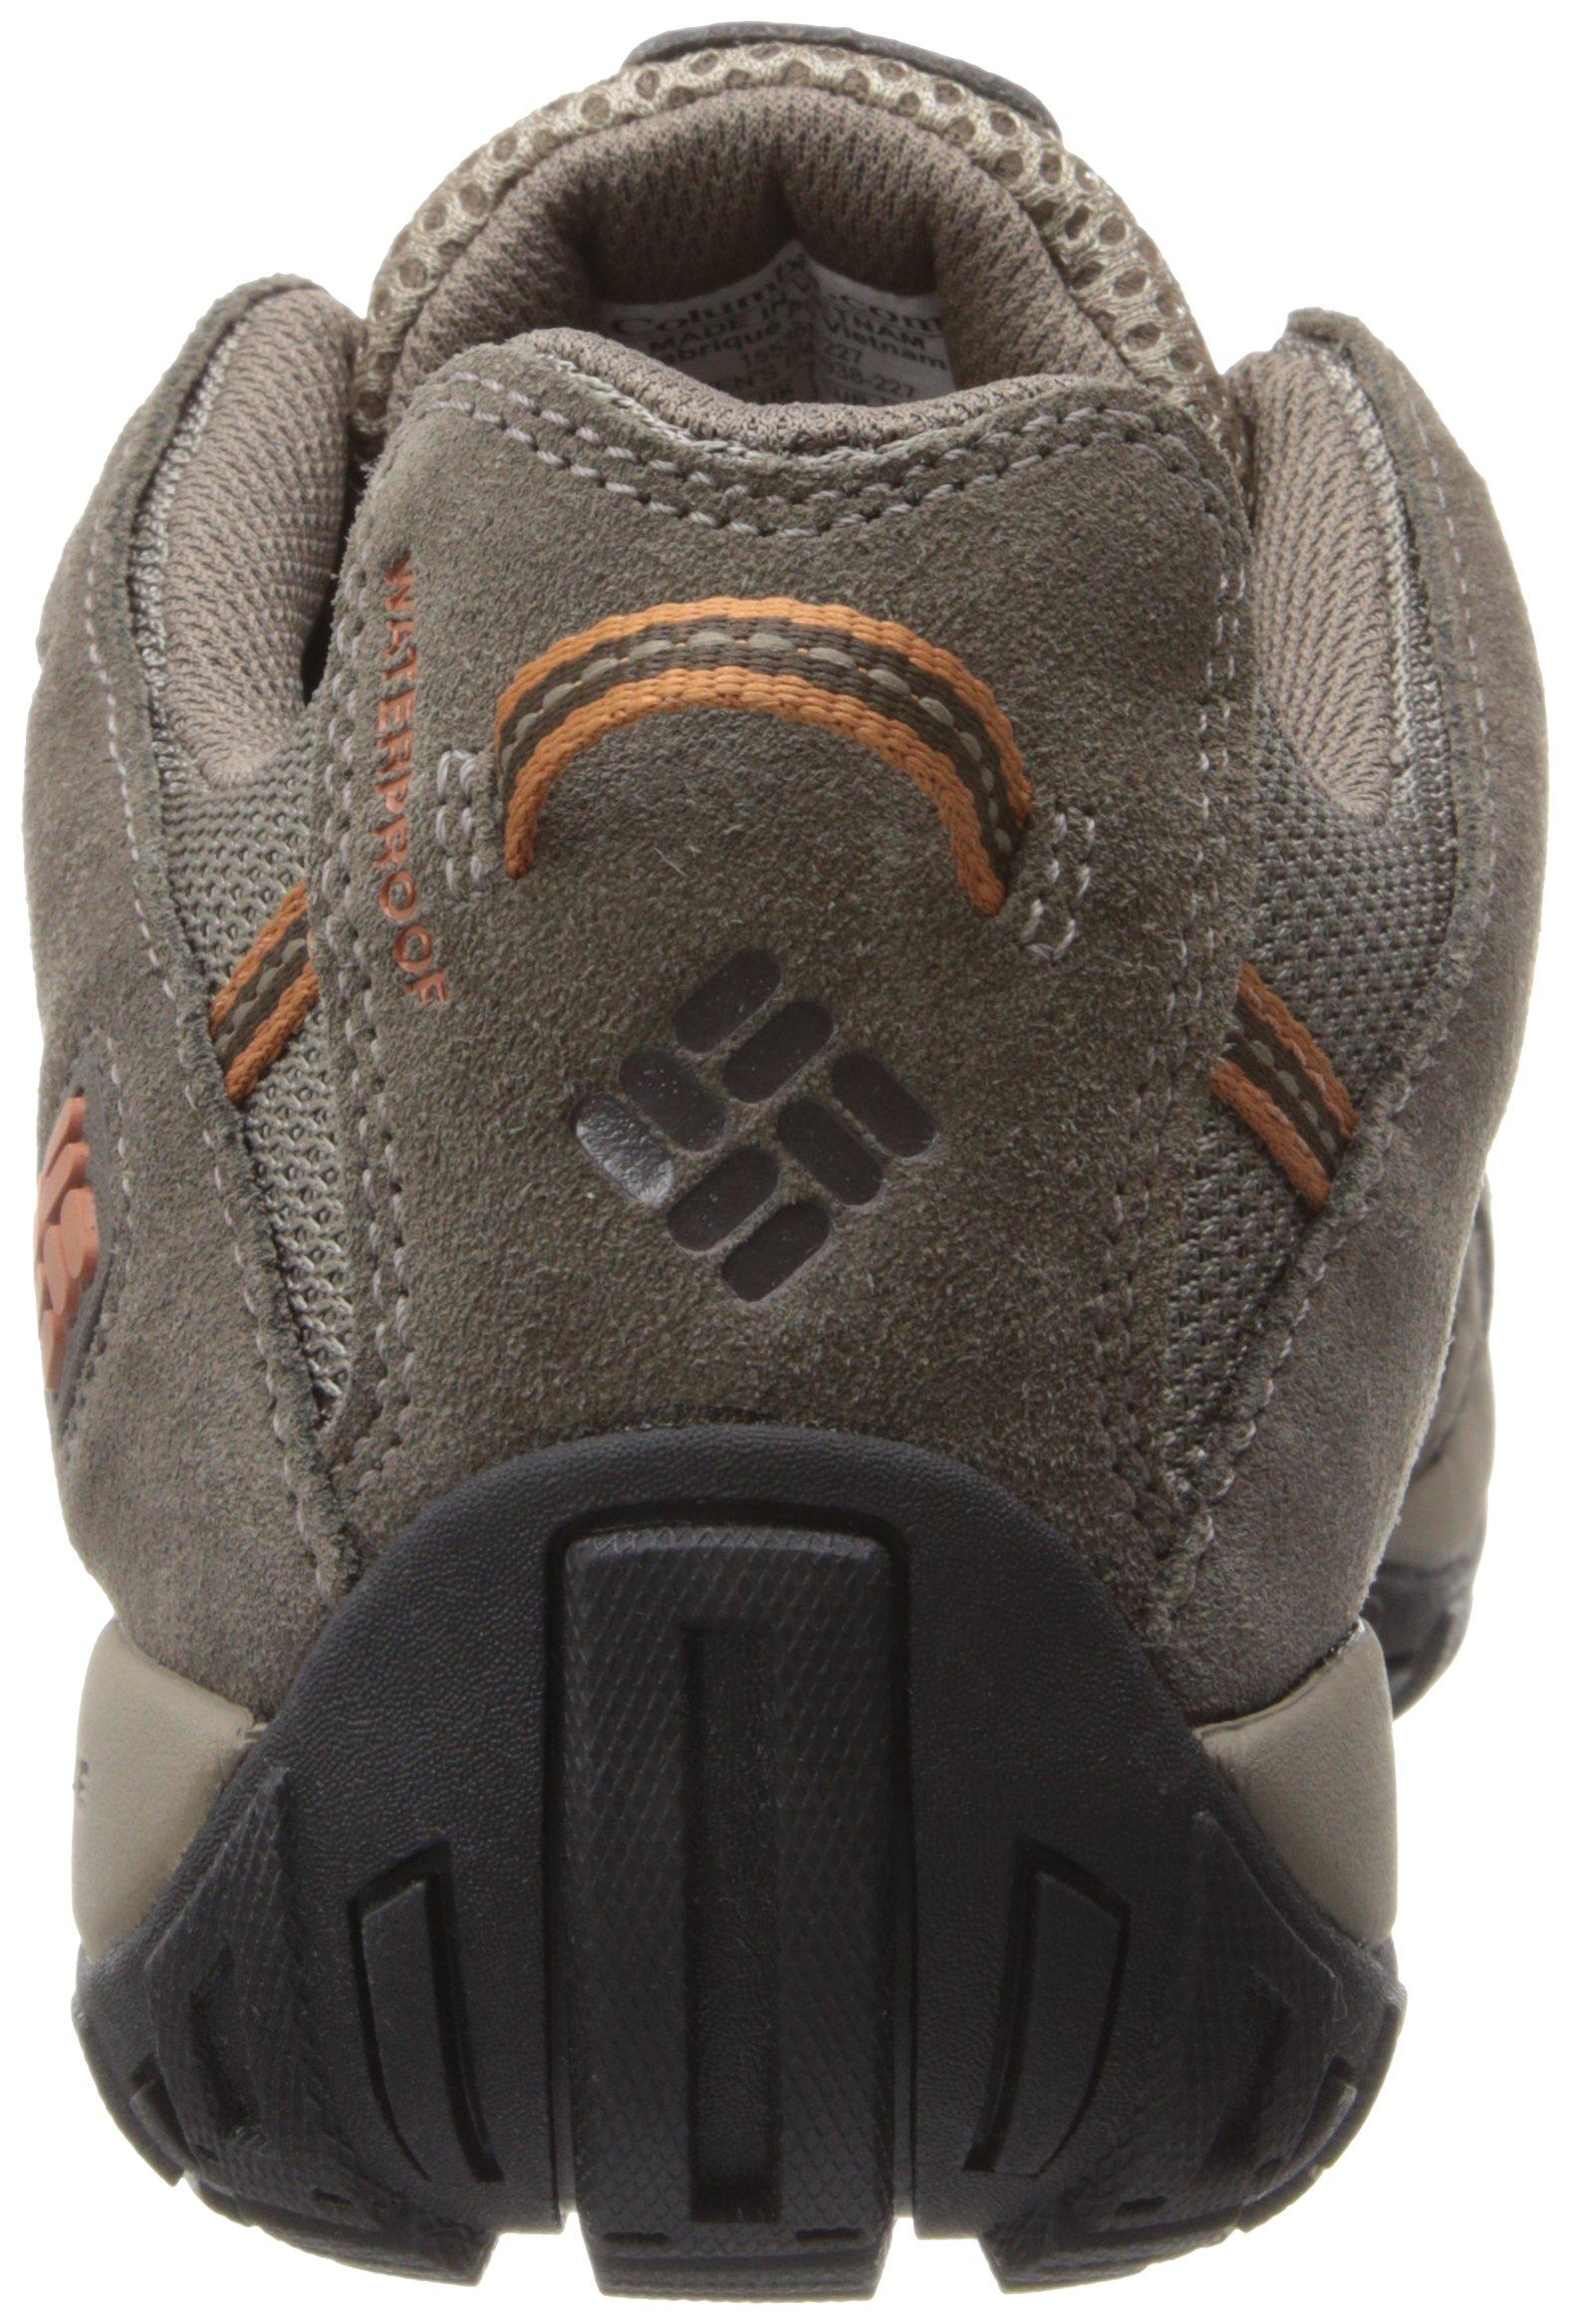 Columbia Men's Redmond Waterproof Hiking Shoe Pebble, Dark Ginger 7 D US by Columbia (Image #2)